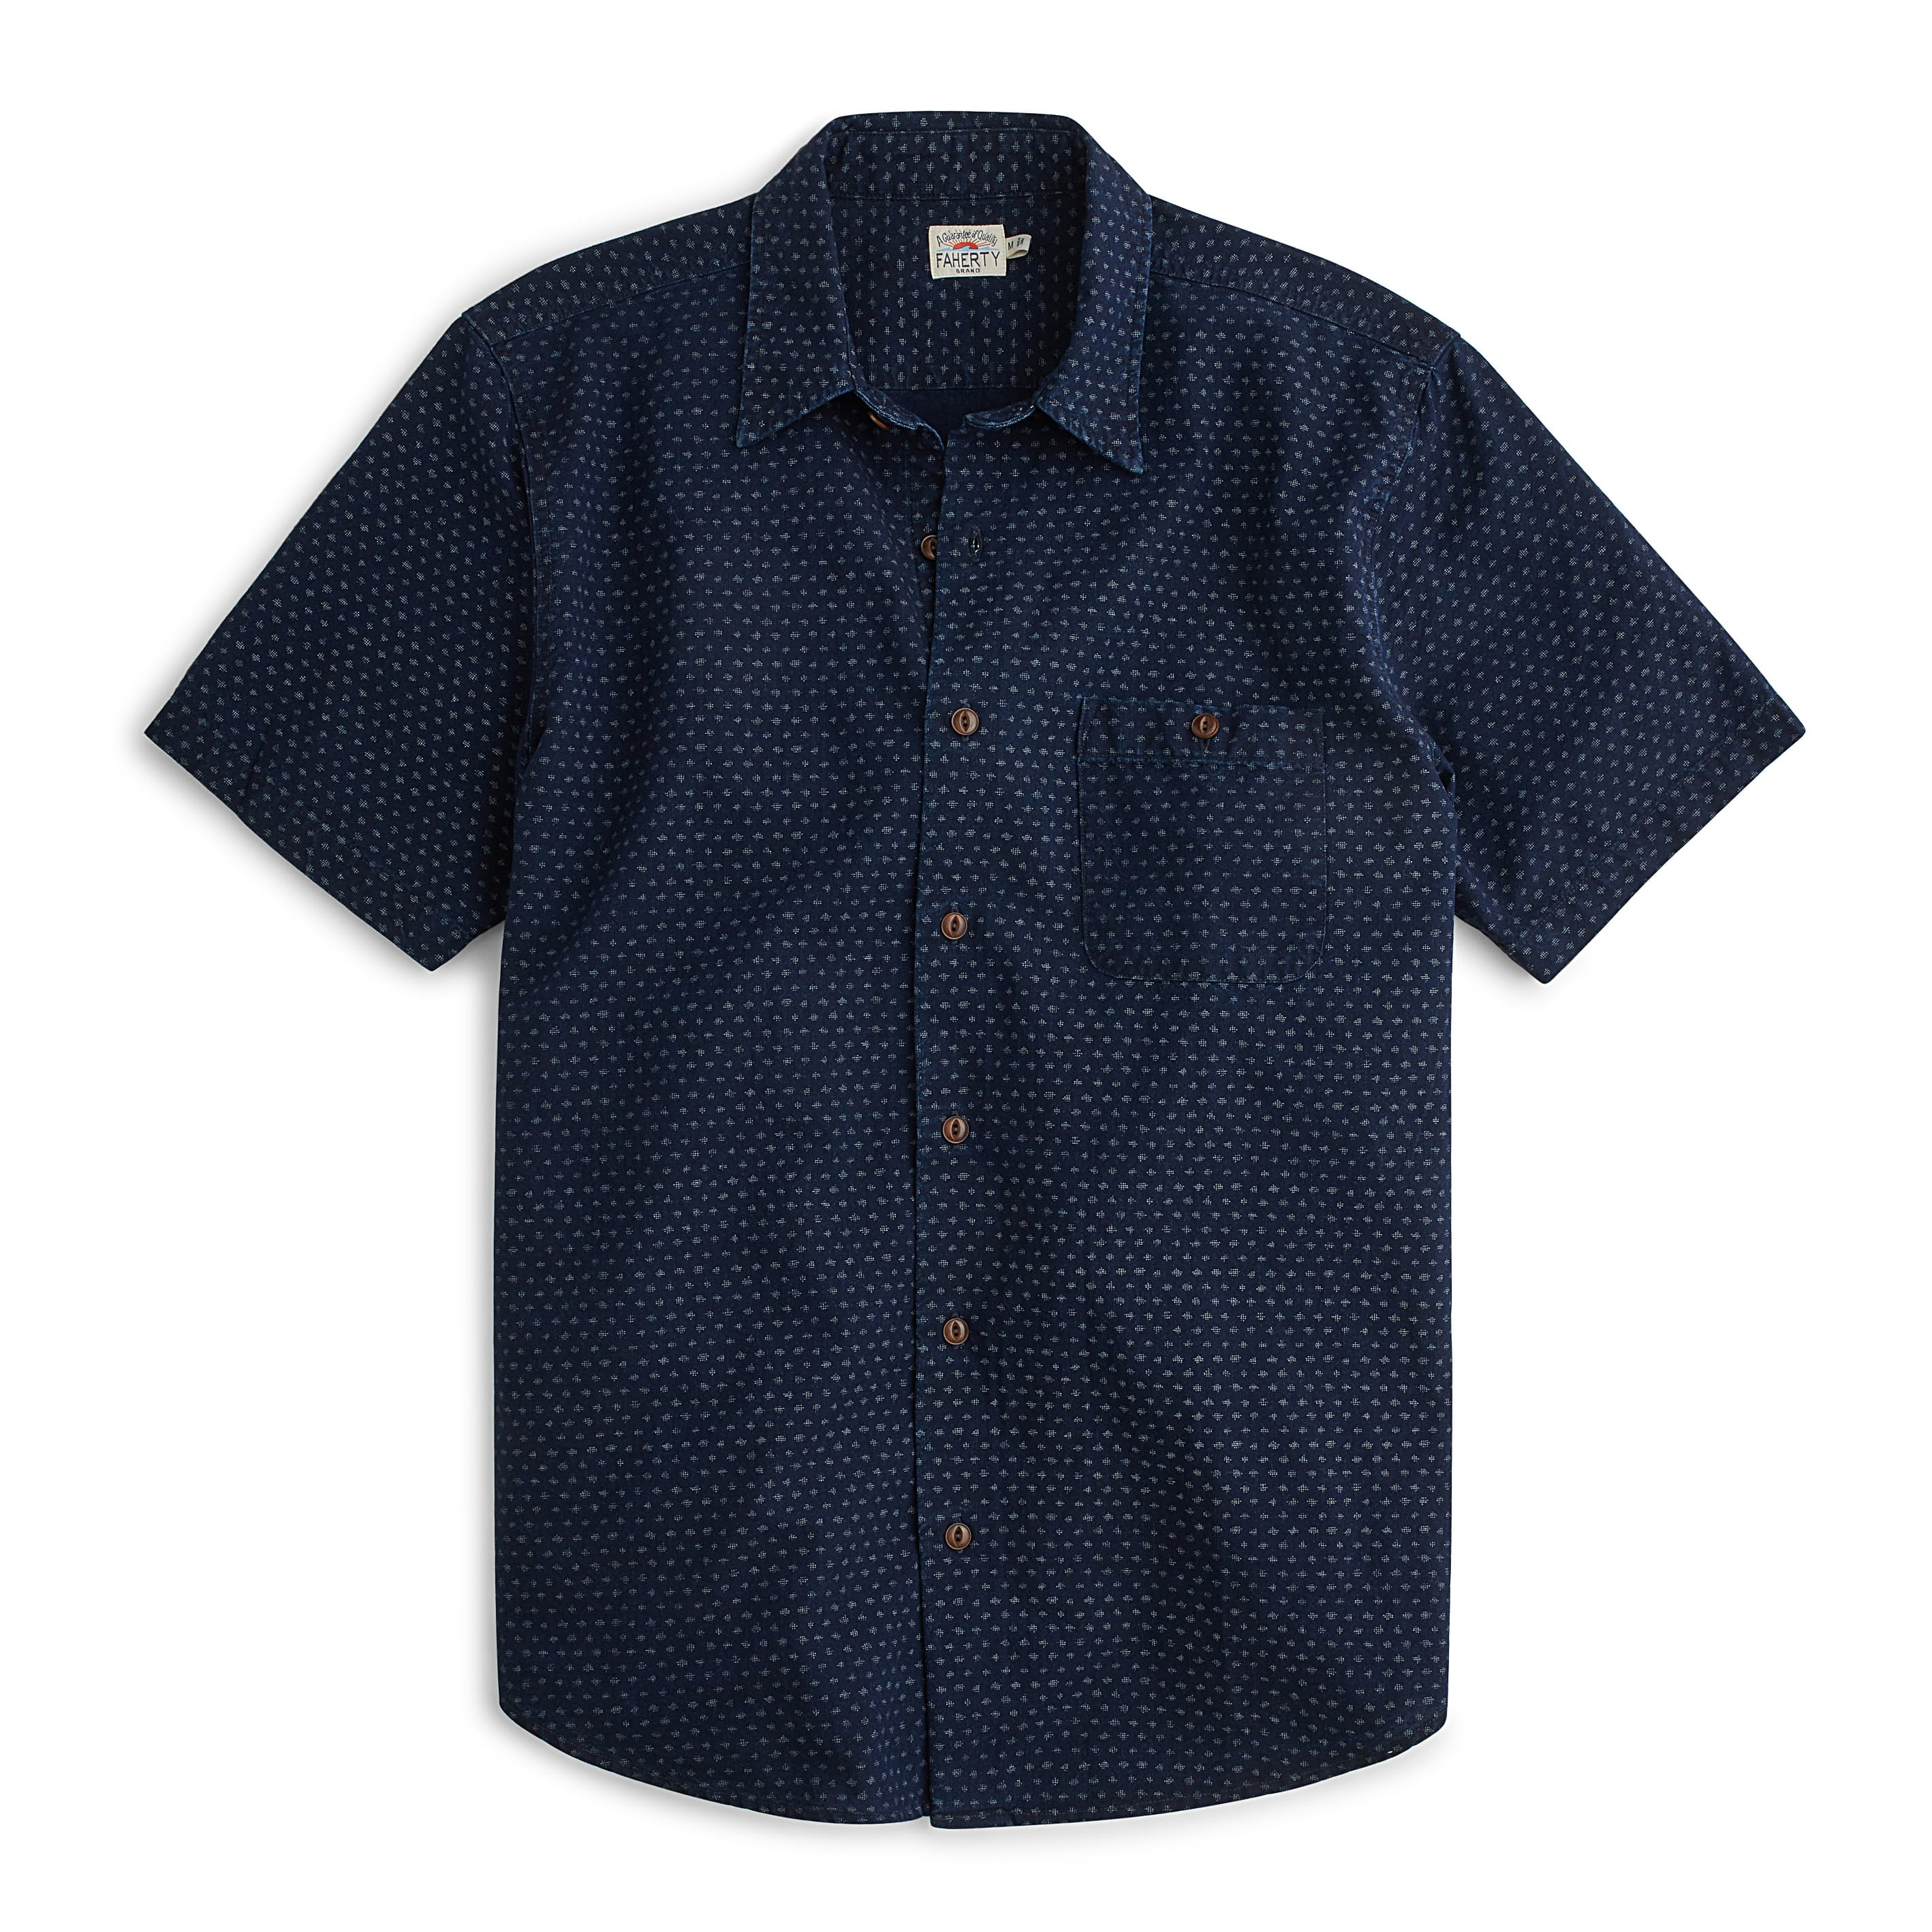 Bxrz4tyq9g faherty brand coast shirt 0 original